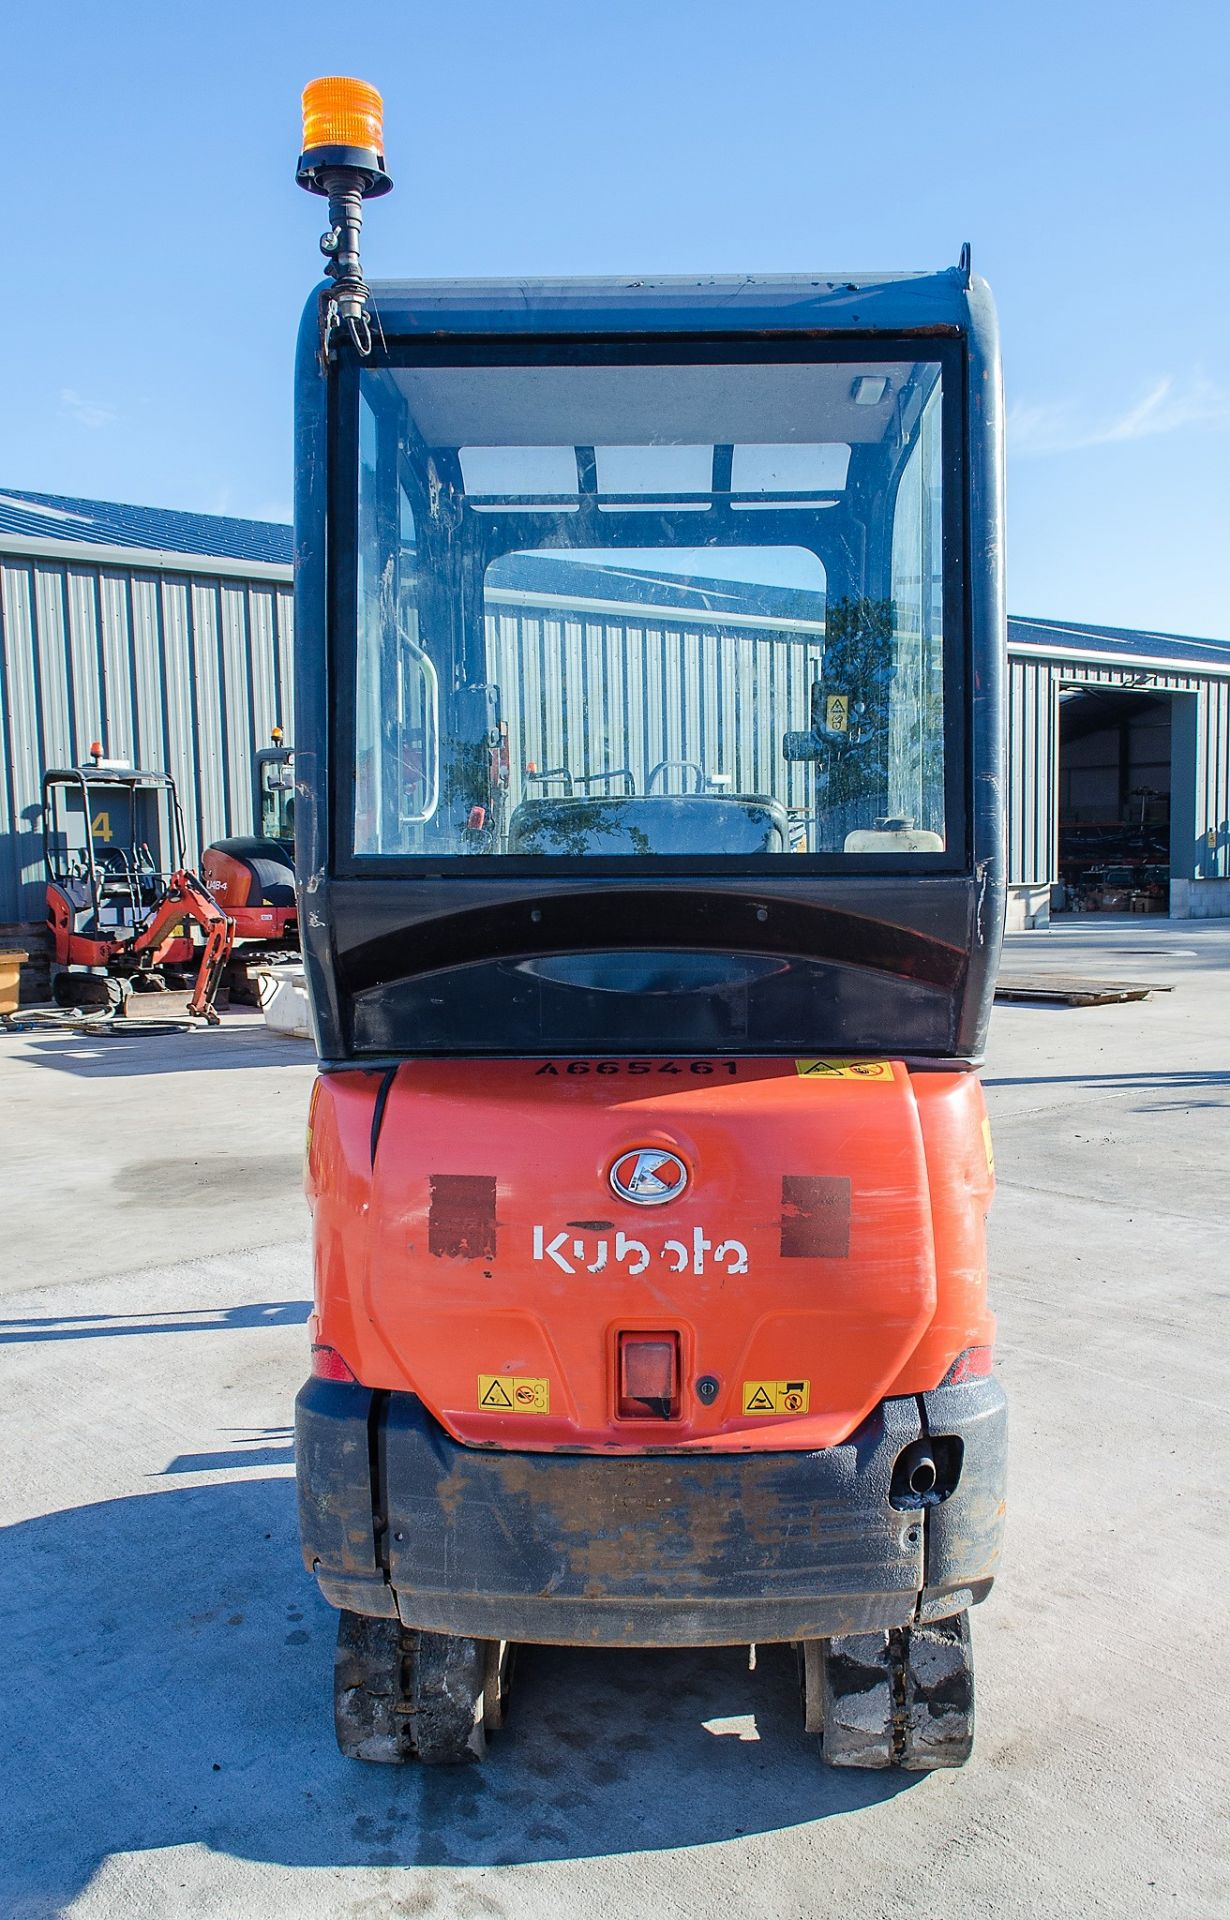 Kubota KX016-4 1.5 tonne rubber tracked mini excavator Year: 2015 S/N: 58688 Recorded Hours: 1736 - Image 6 of 19